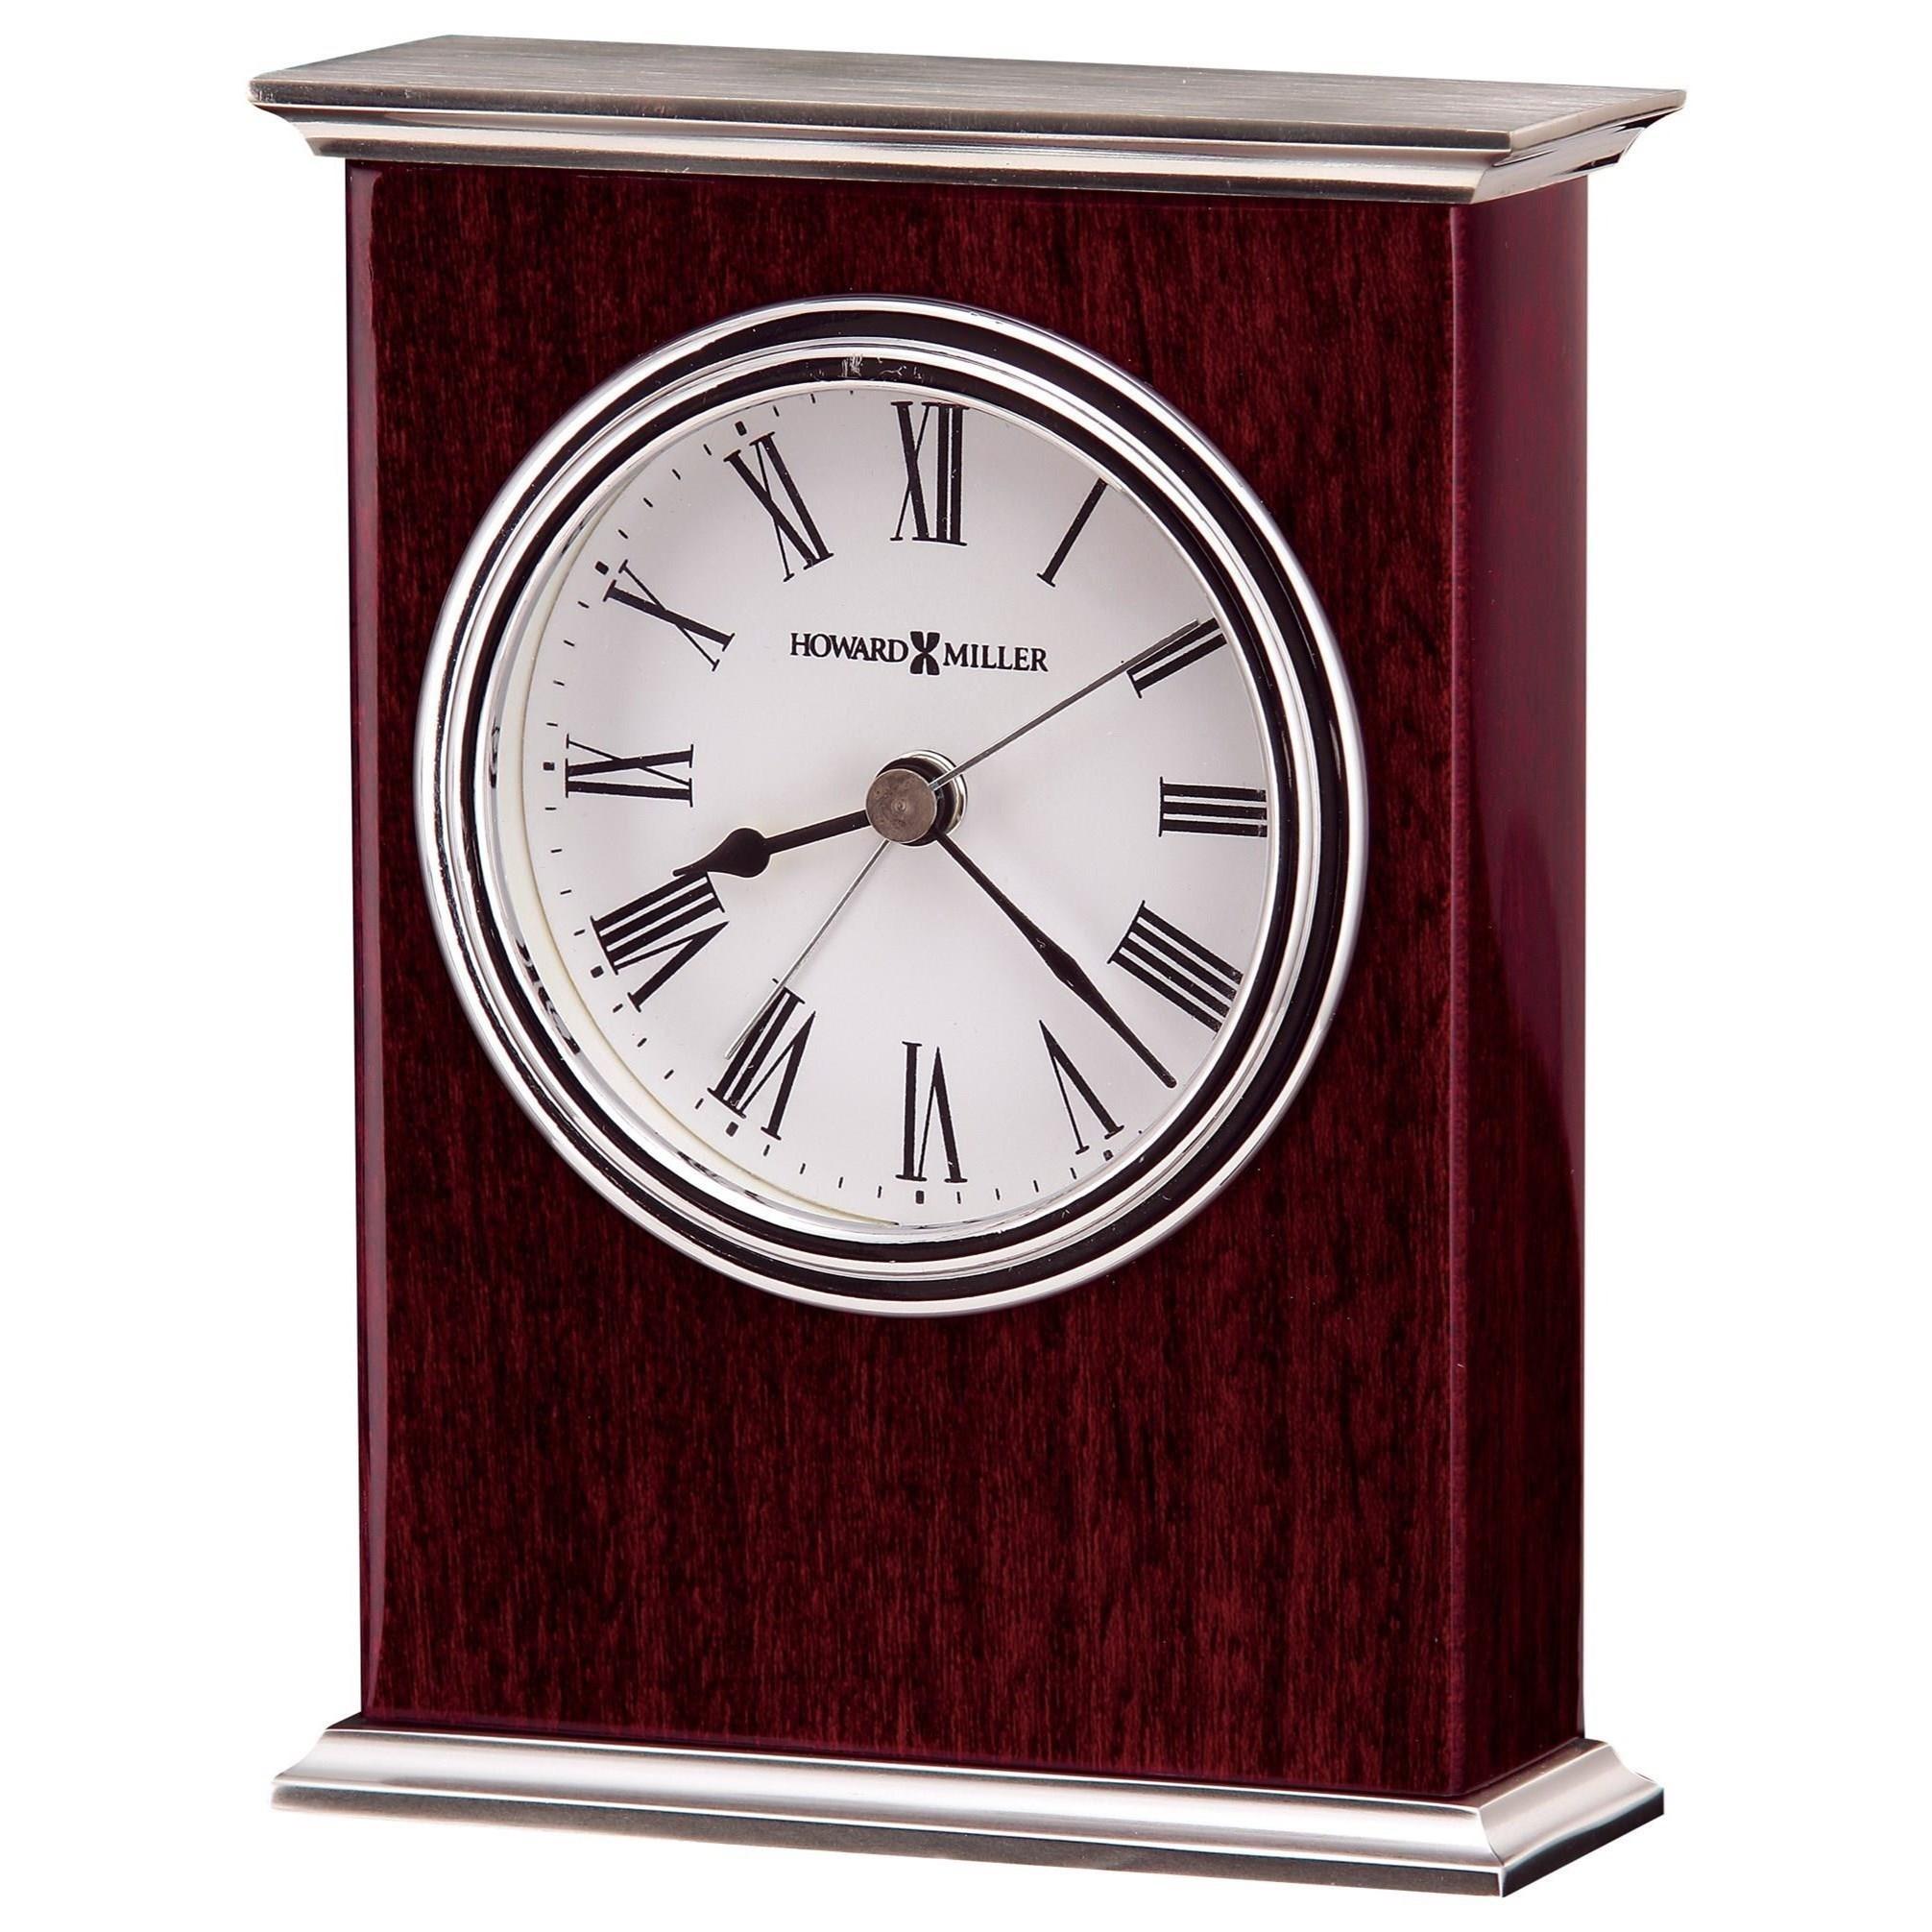 Howard Miller Table U0026 Mantel Clocks Kentwood Table Alarm Clock